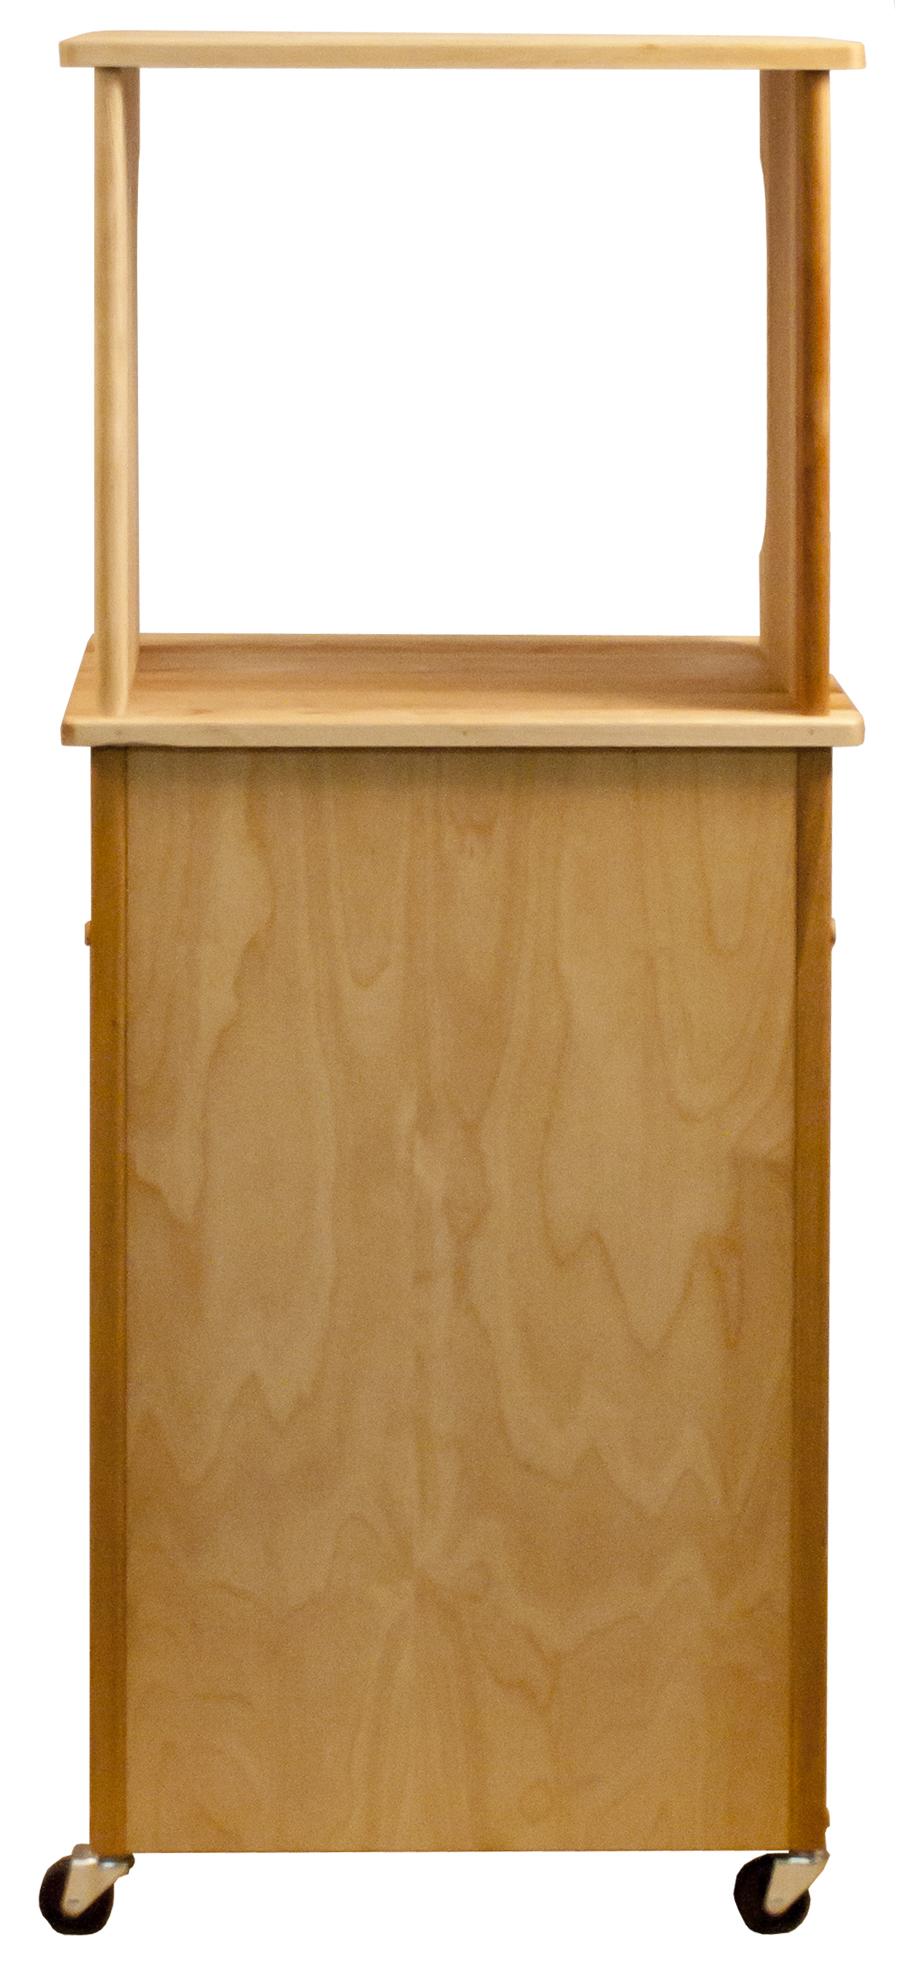 catskill microwave cart open shelf closed cabinet decordots kitchen